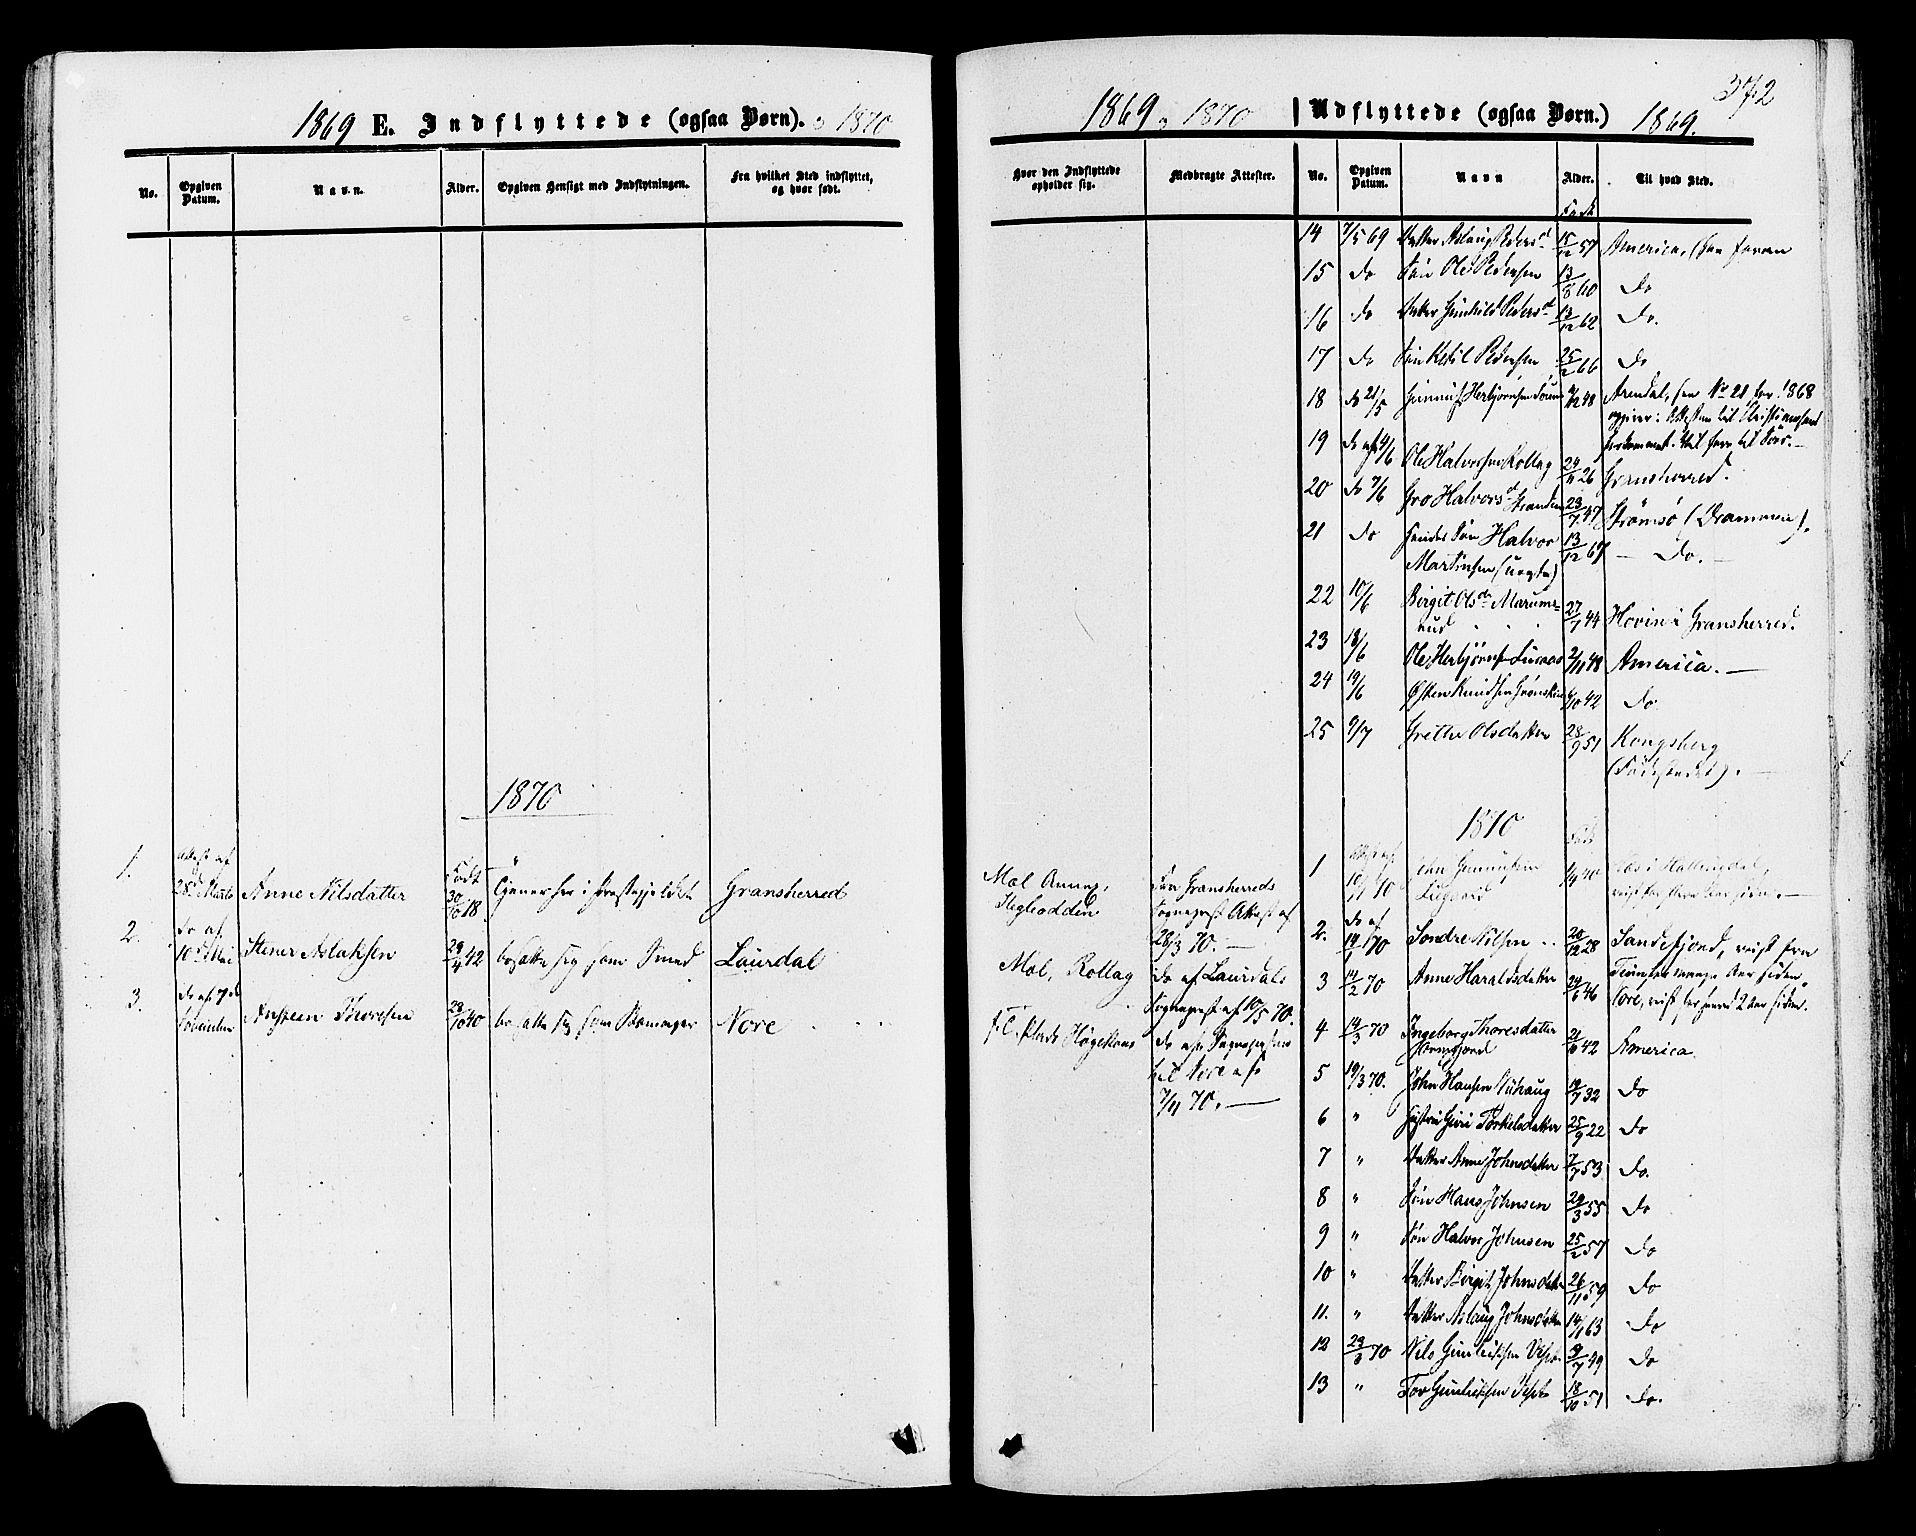 SAKO, Tinn kirkebøker, F/Fa/L0006: Ministerialbok nr. I 6, 1857-1878, s. 372